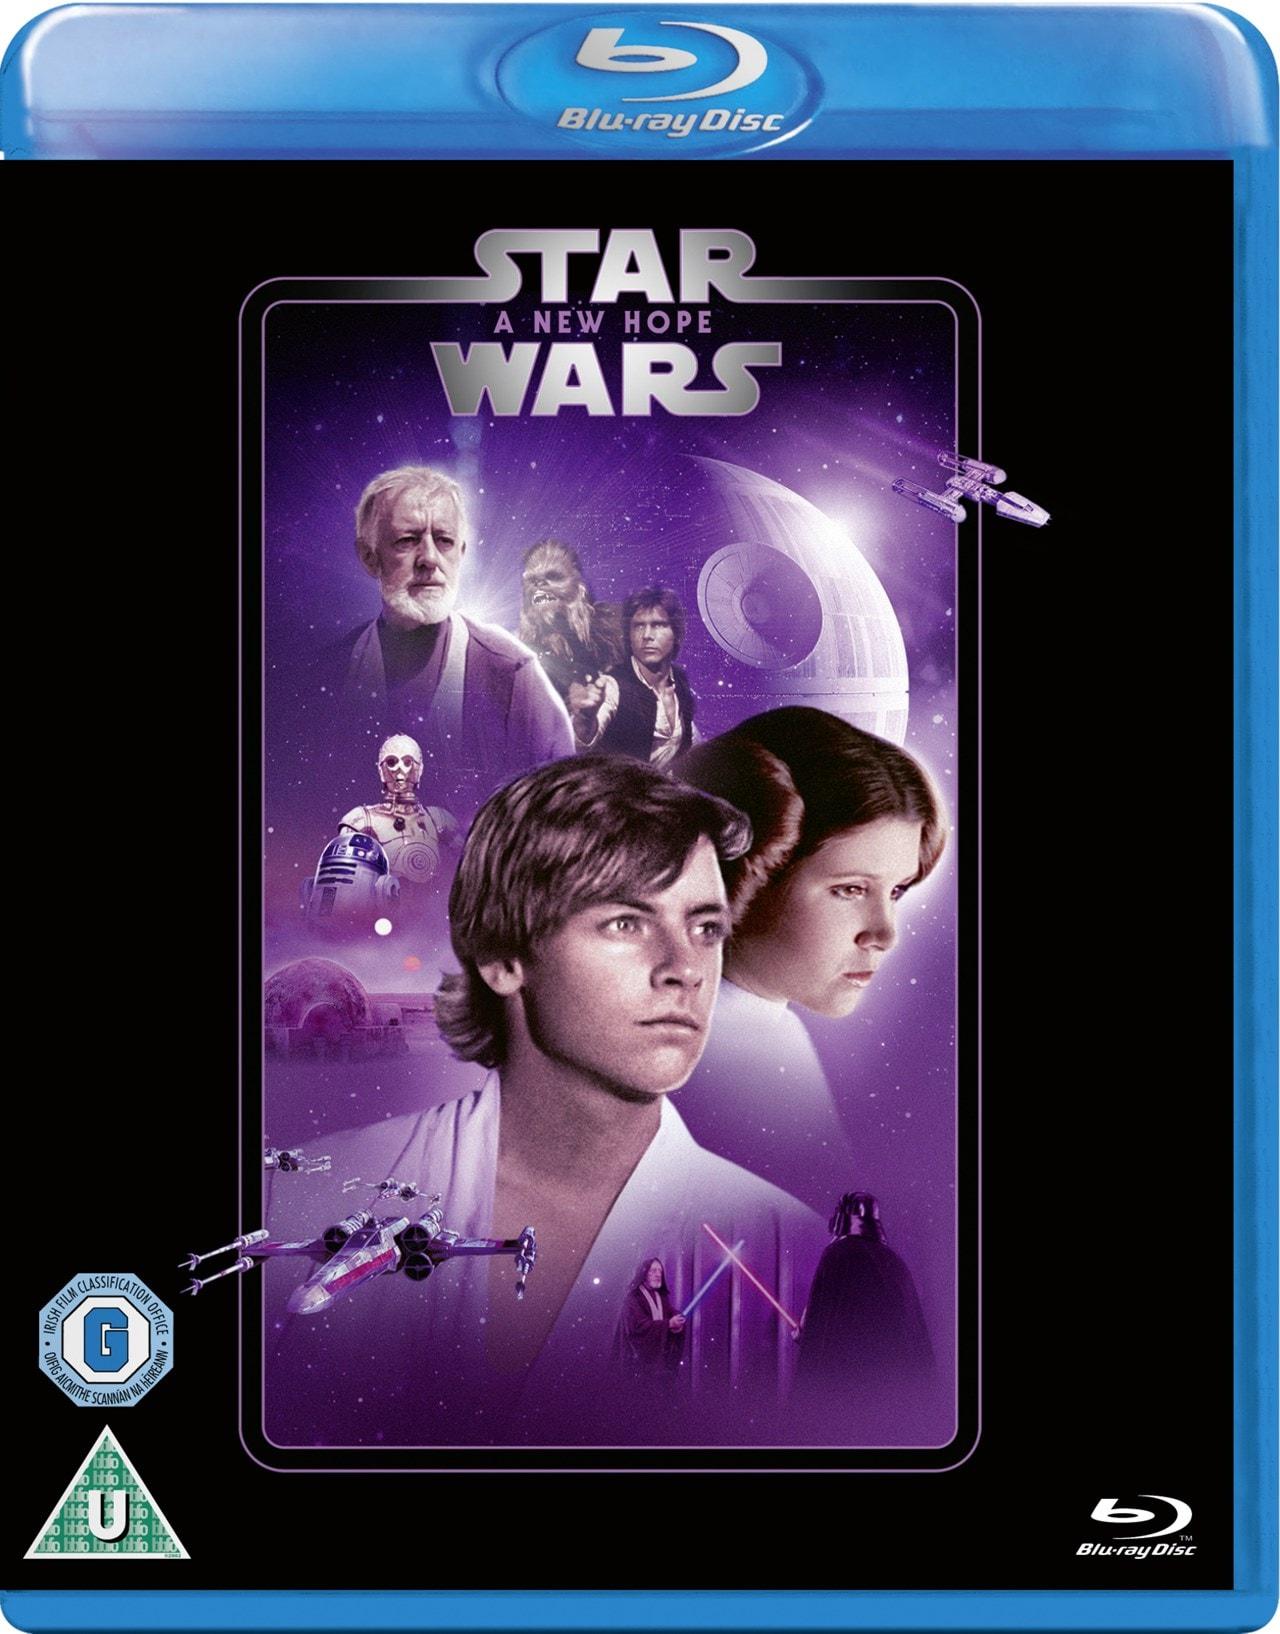 Star Wars: Episode IV - A New Hope - 1